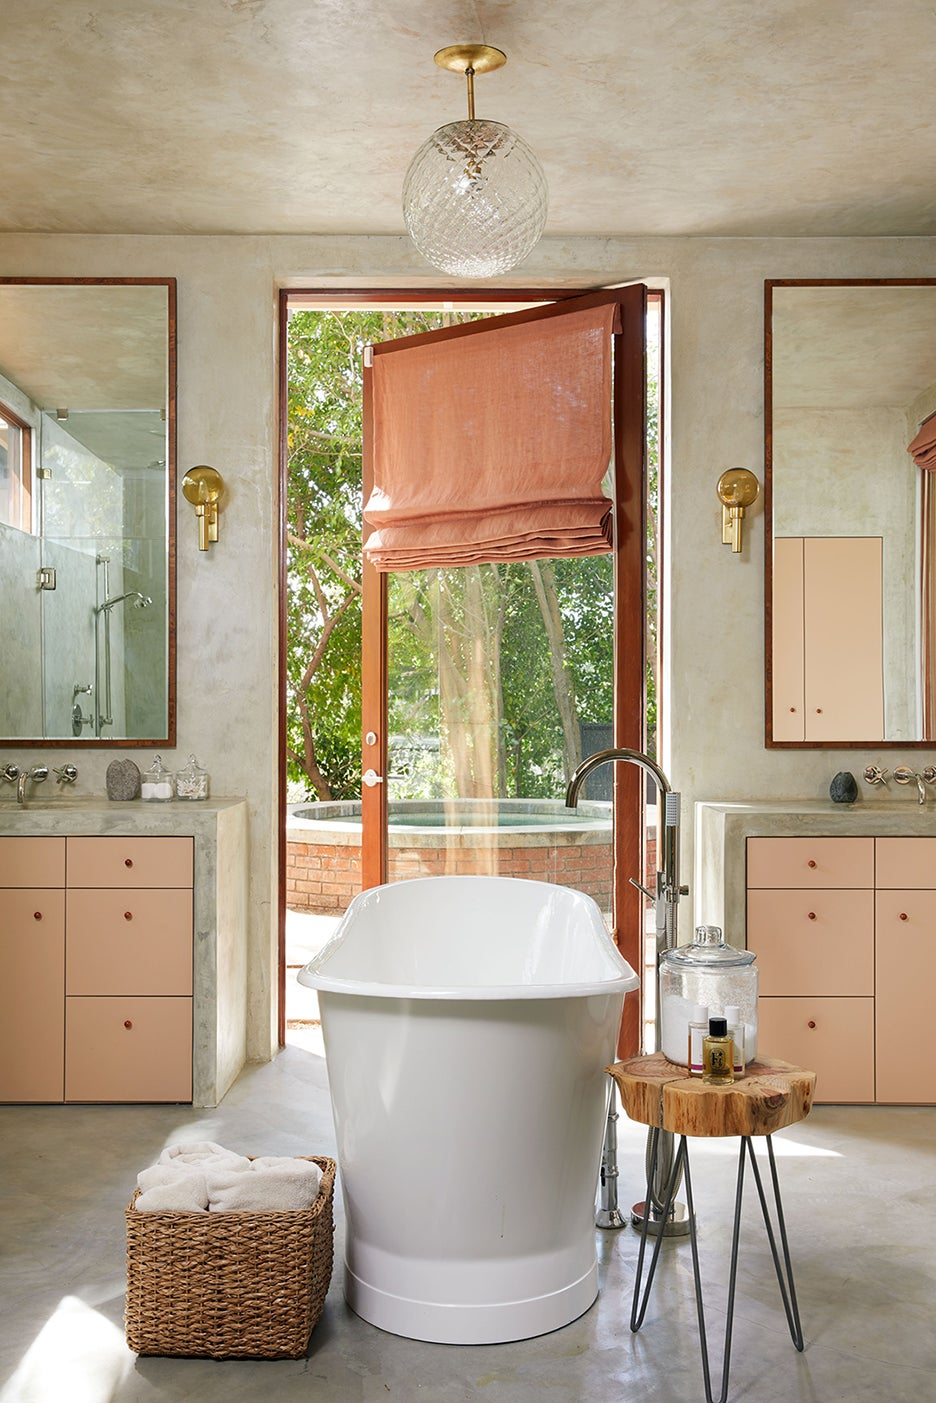 Concrete bathroom with blush curtains